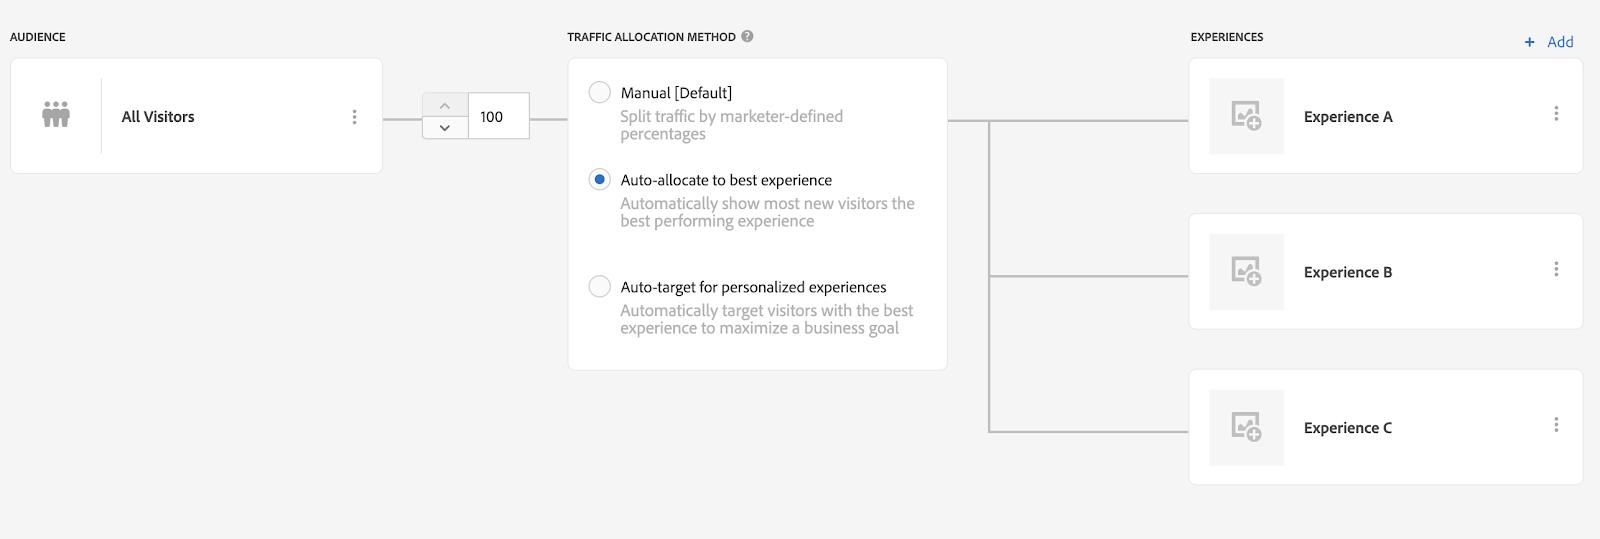 image of adobe target auto-allocate activities